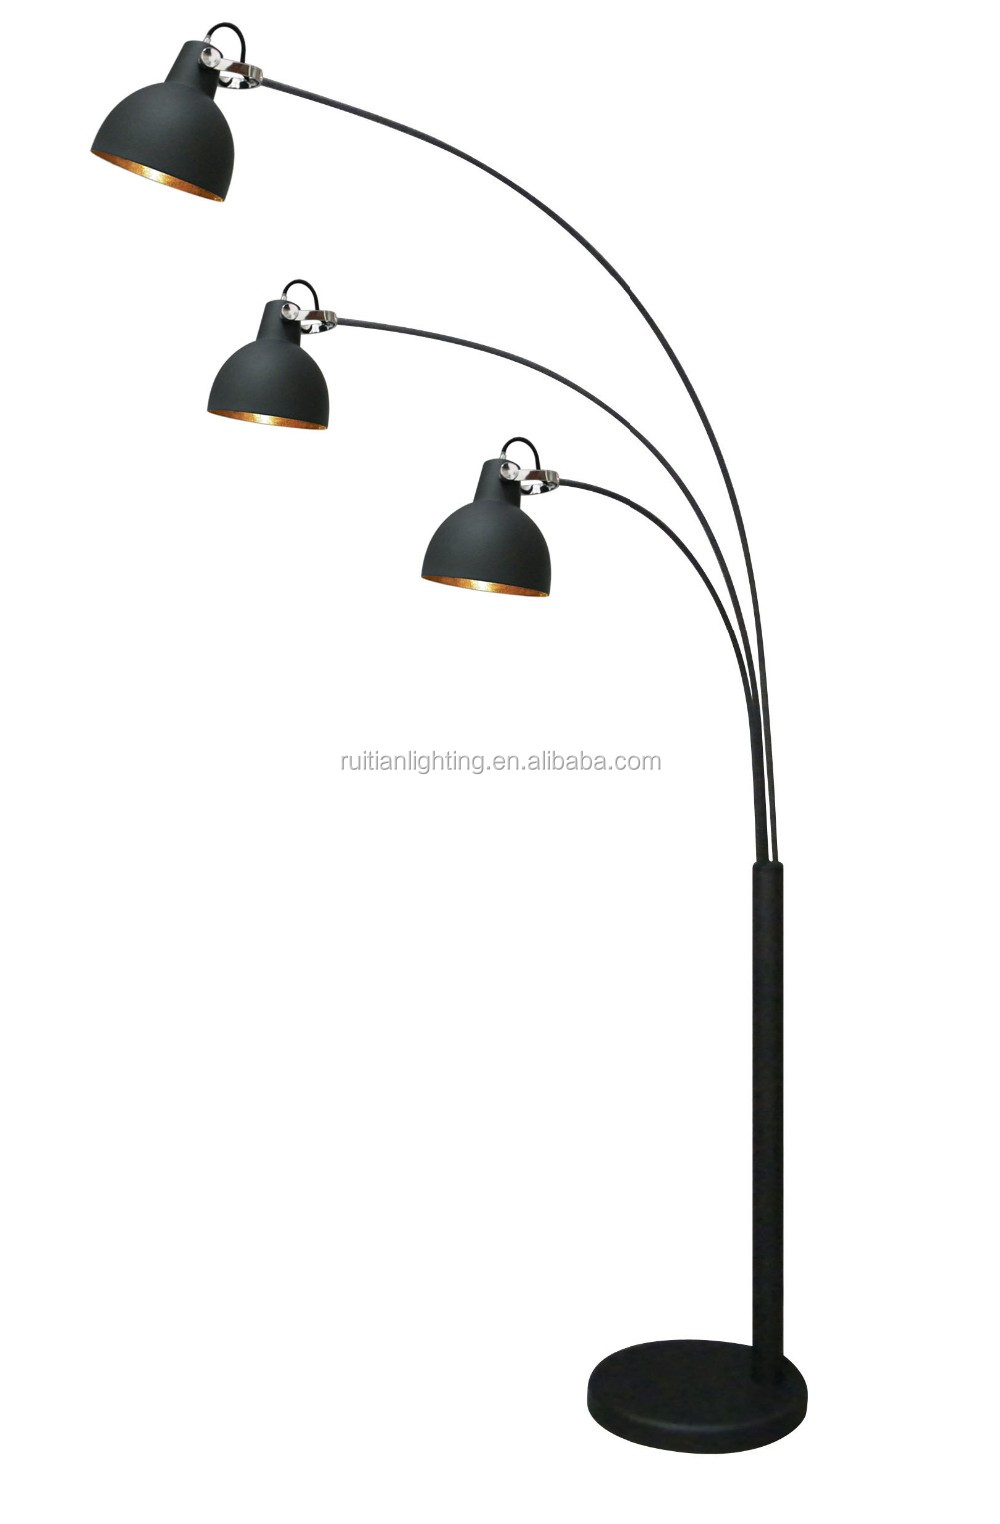 Simple Design Downlight Floor Lamps Standing Black Or Customized ...